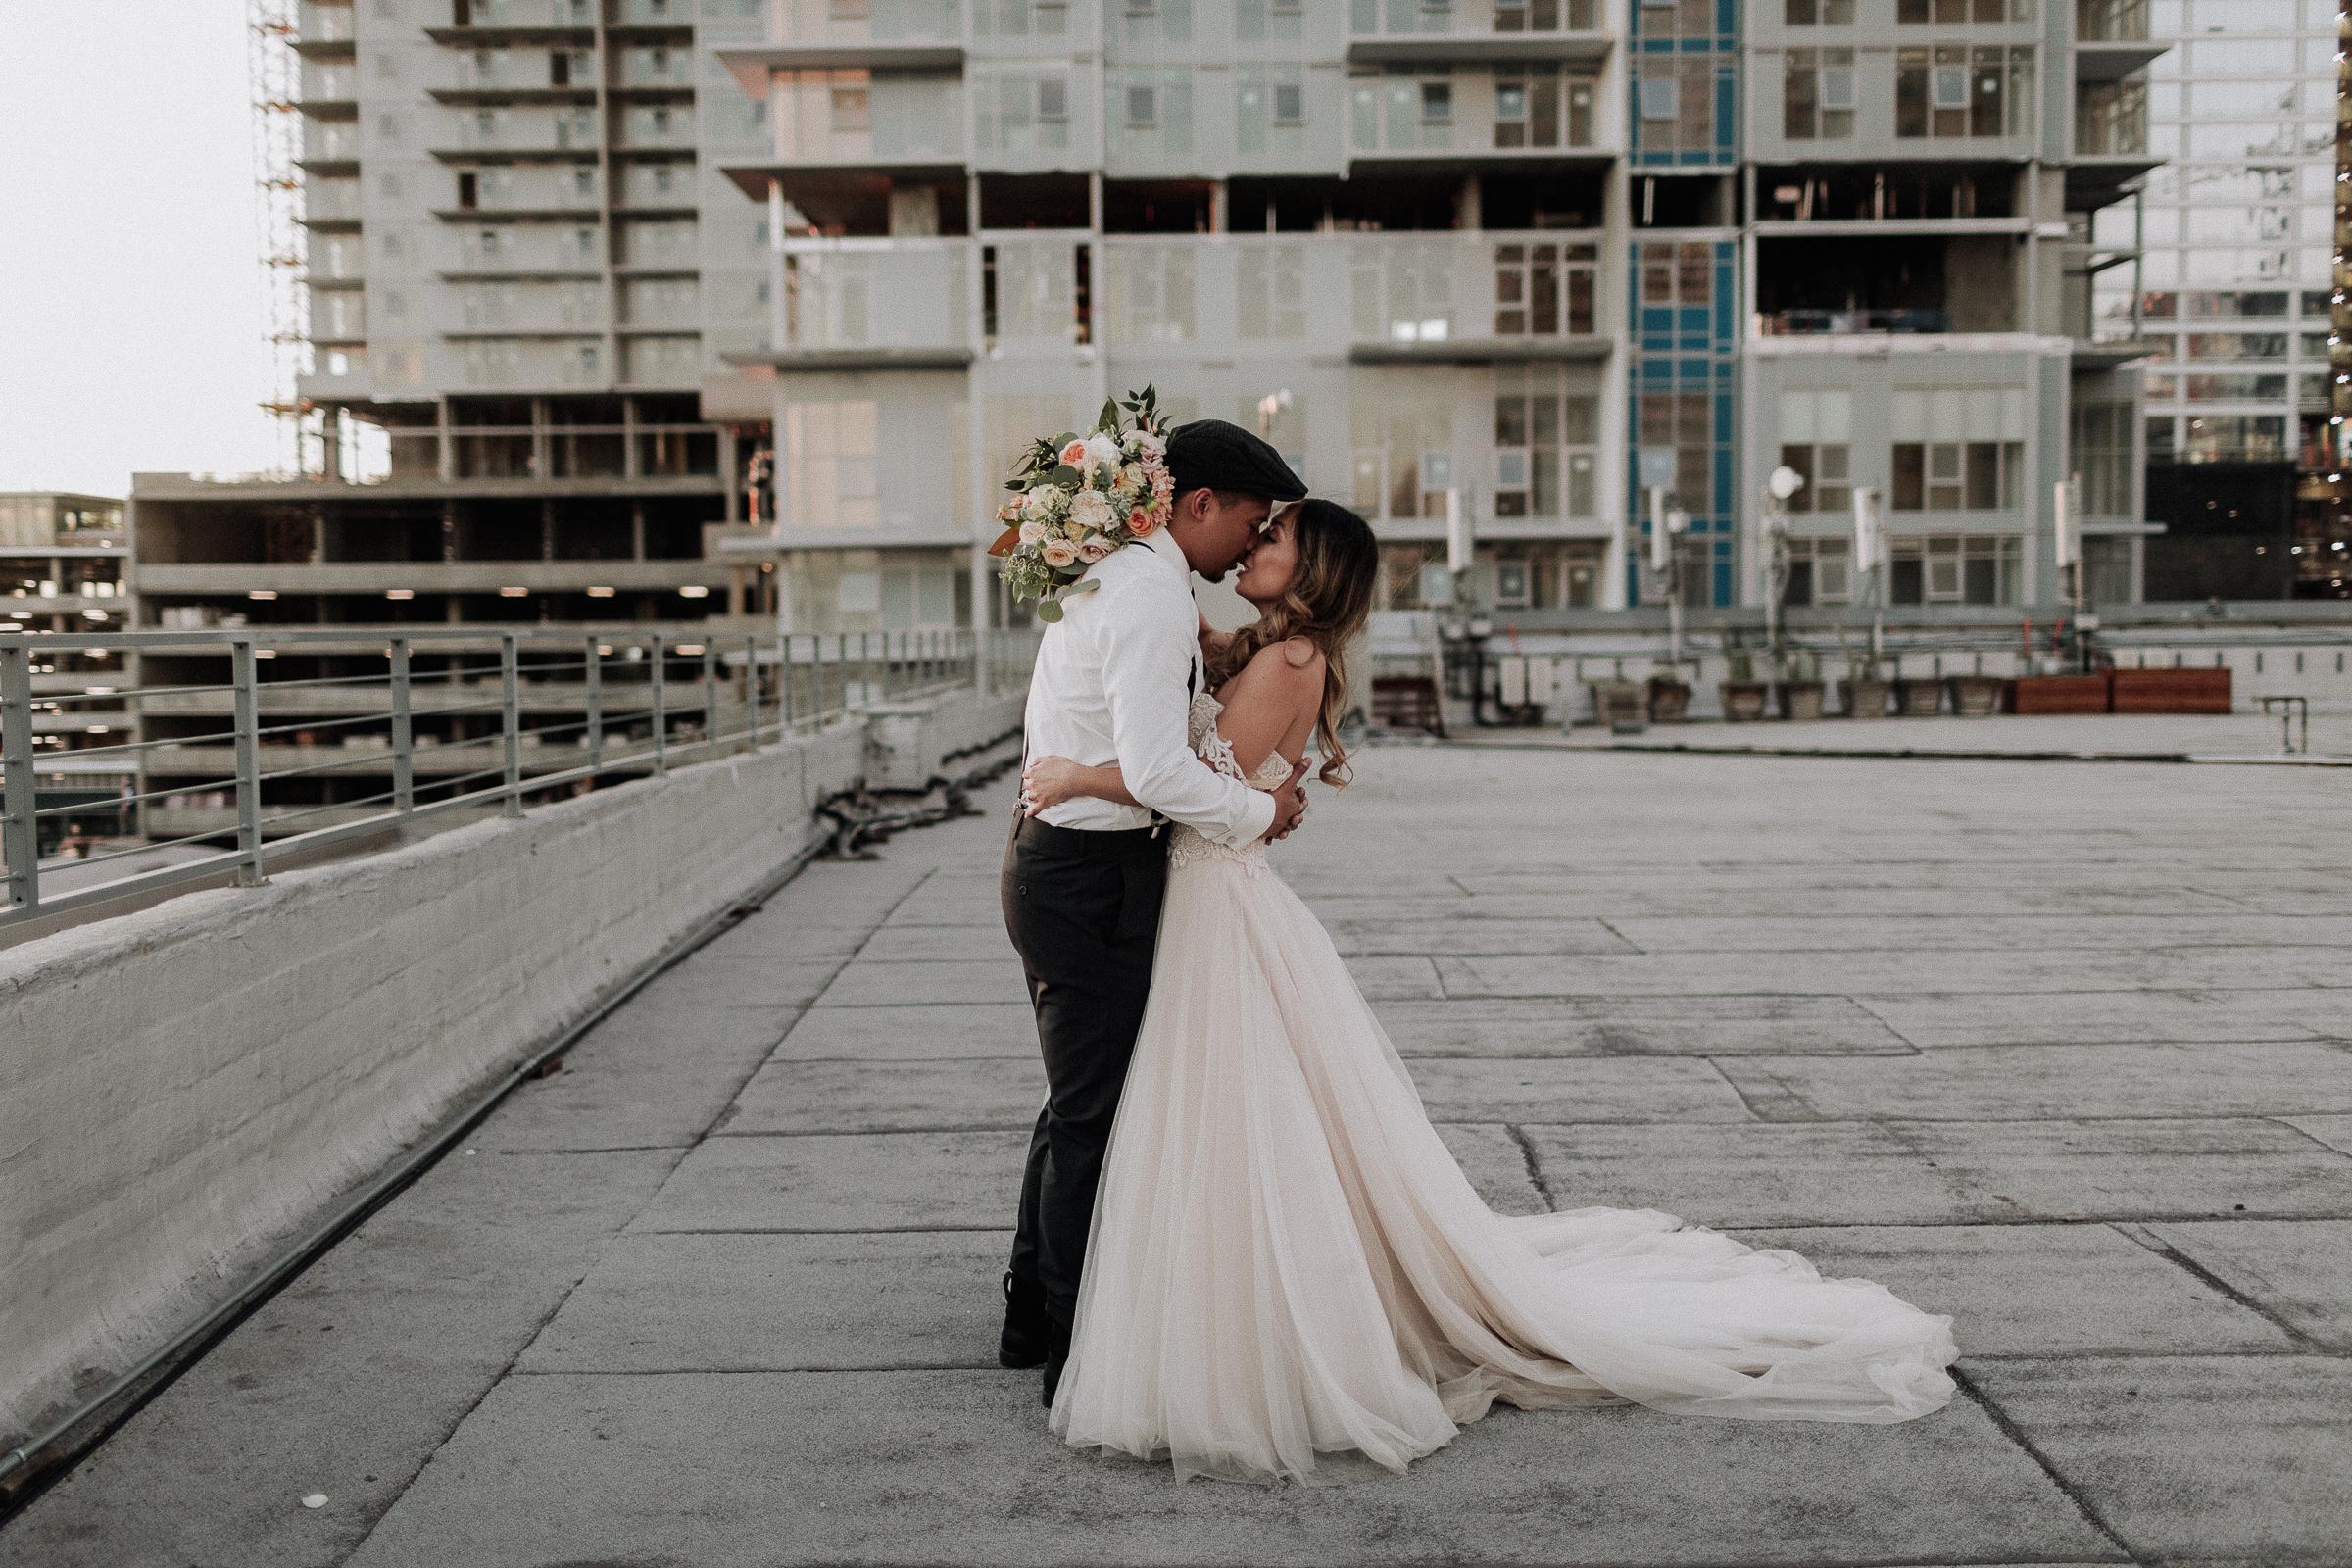 Gretchen Gause Photography | Los Angeles Hudson Loft Wedding #hudsonloft #laweddingphotographer #DTLA #weddingplanning #romanticwedding #rooftopwedding #weddingphotography #weddingdress #sunsetphotos